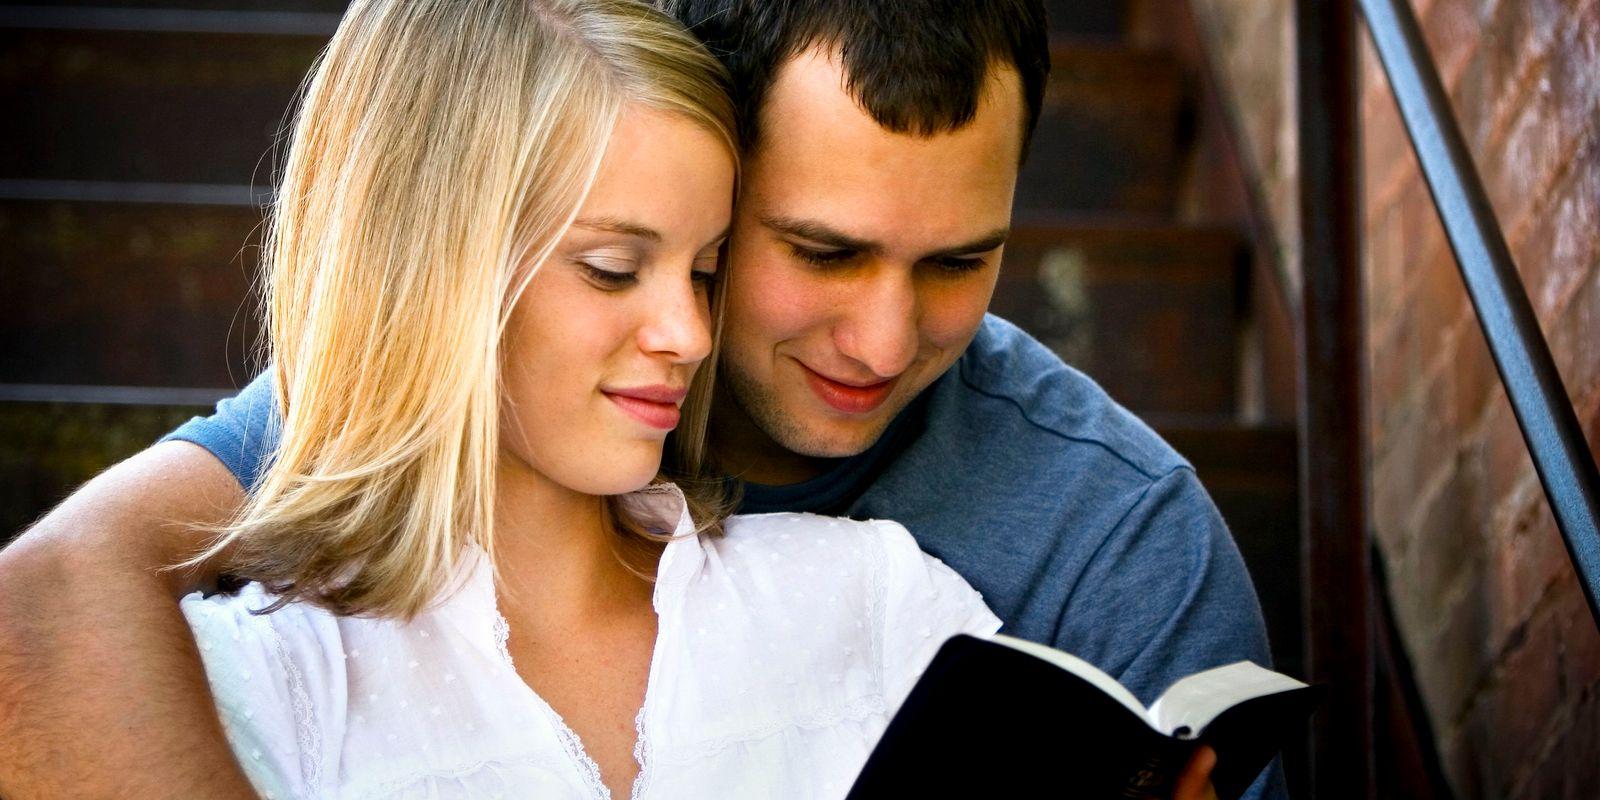 Kostenlose lds single dating sites